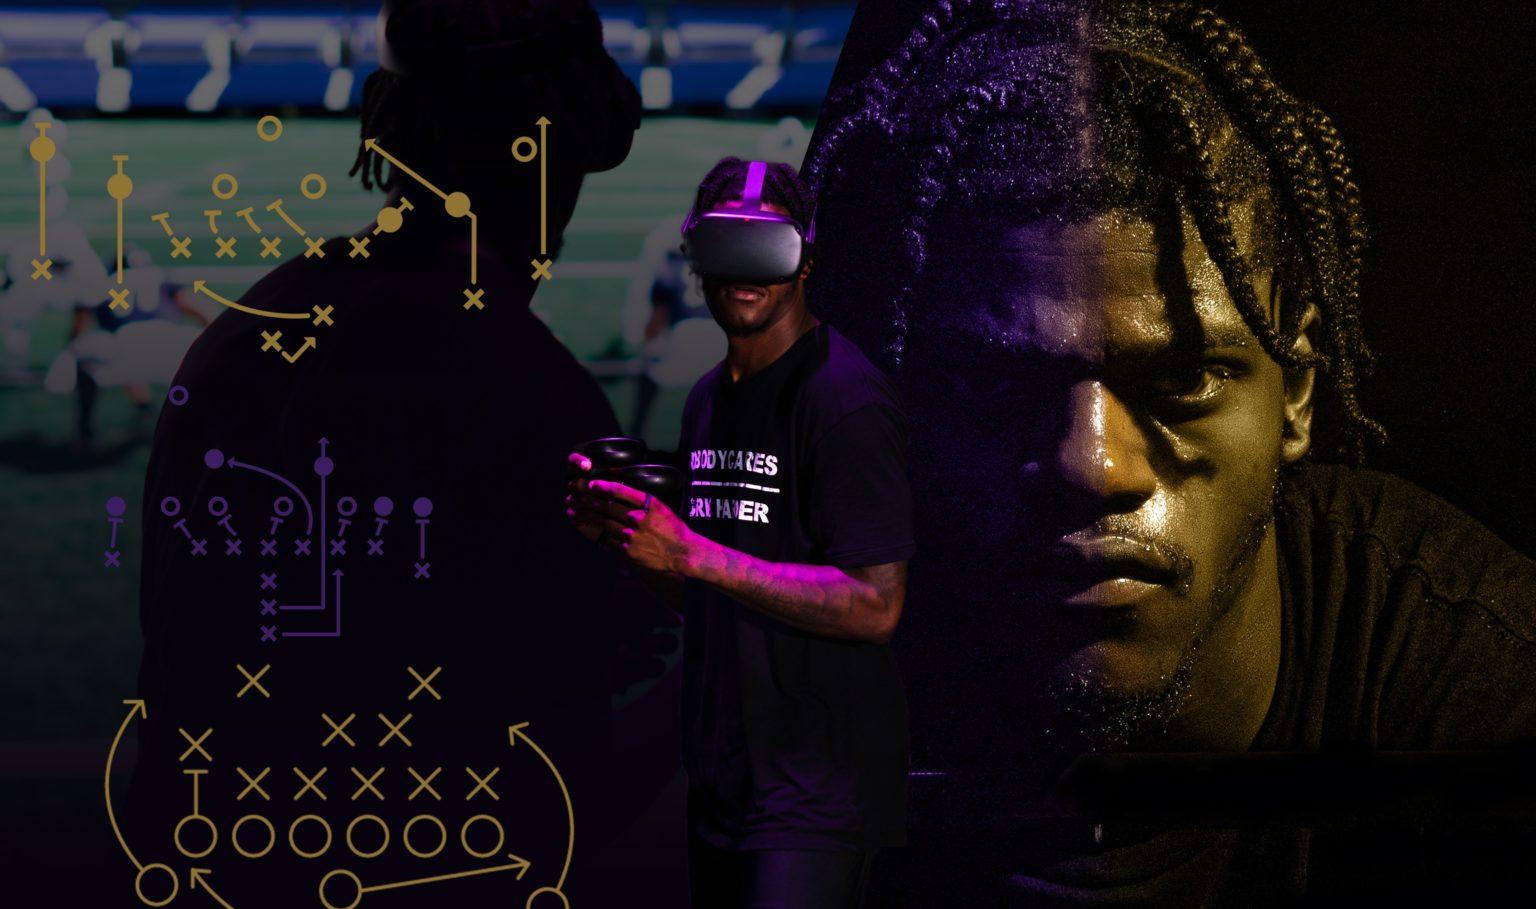 NFL职业球员拉马尔·杰克逊代言VR产品